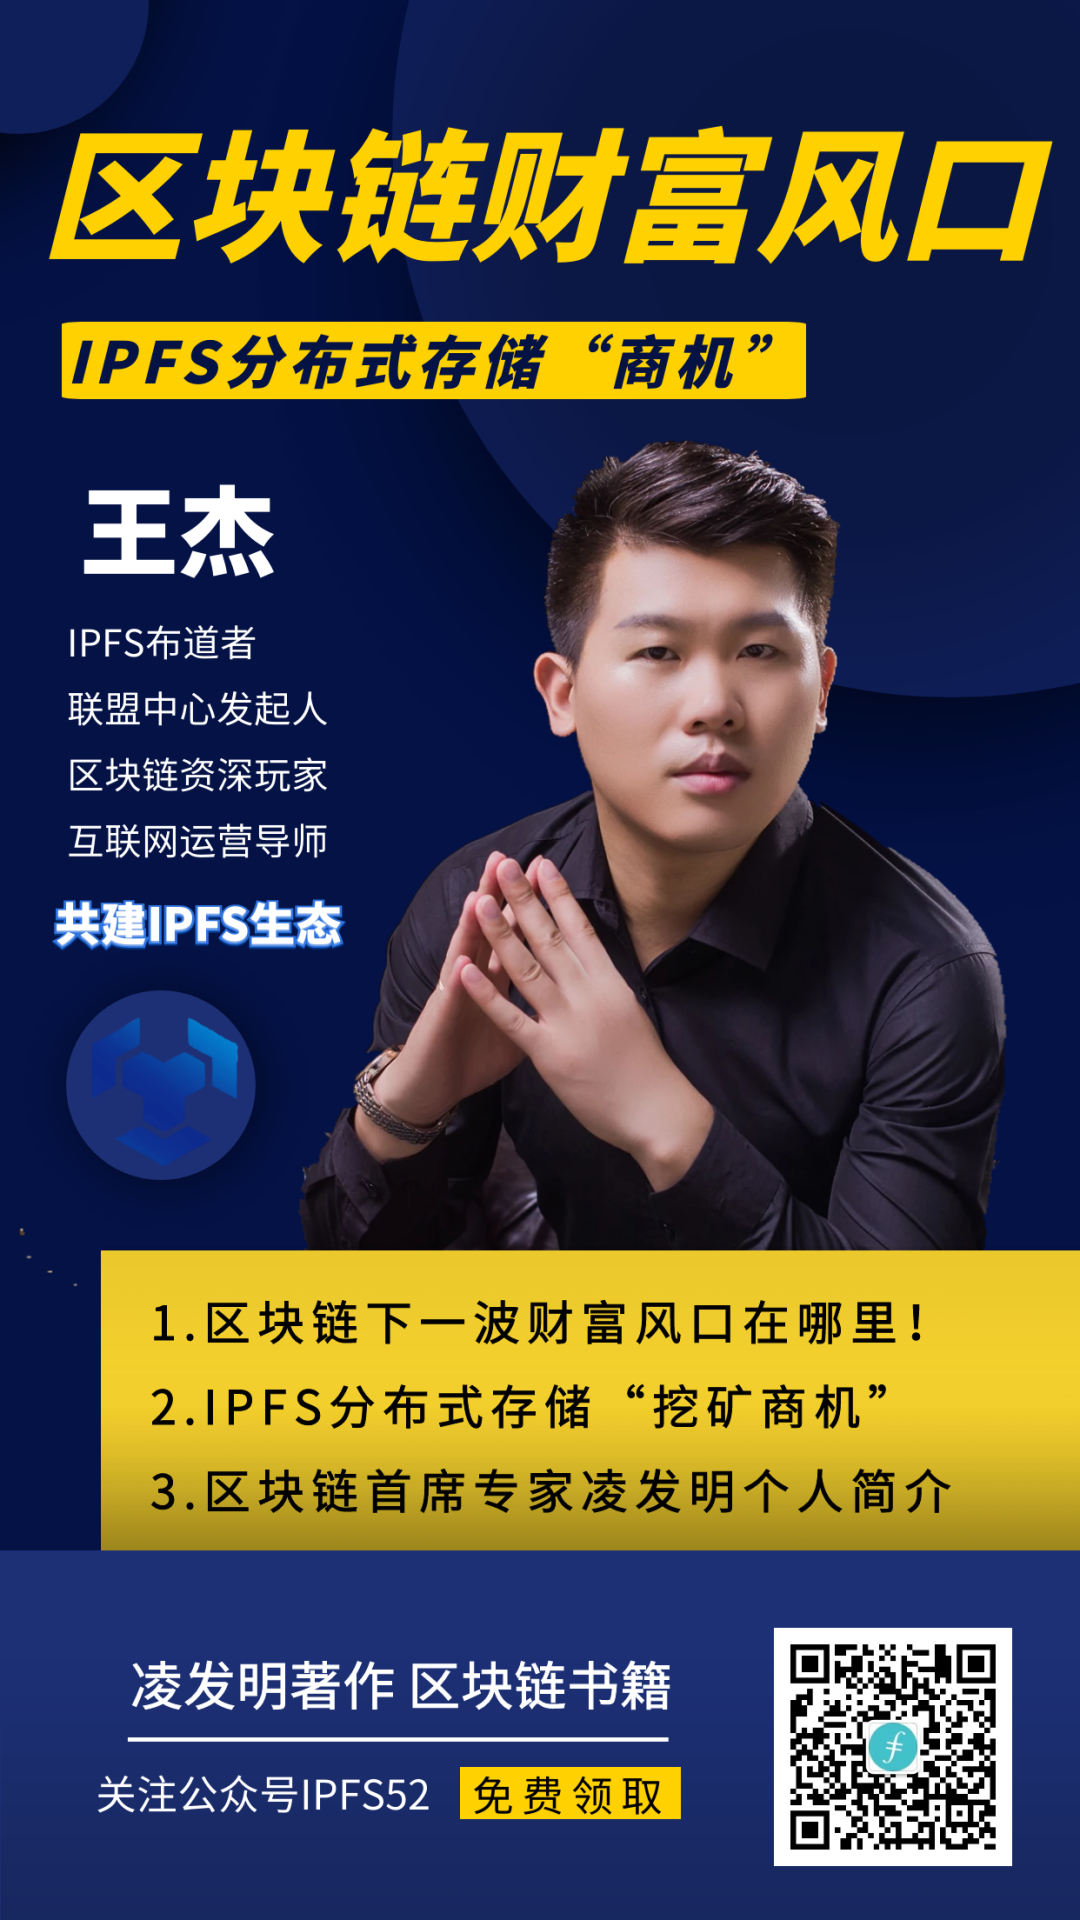 IPFS赚钱吗?IPFS为什么可以将互联网数据保存一千年?